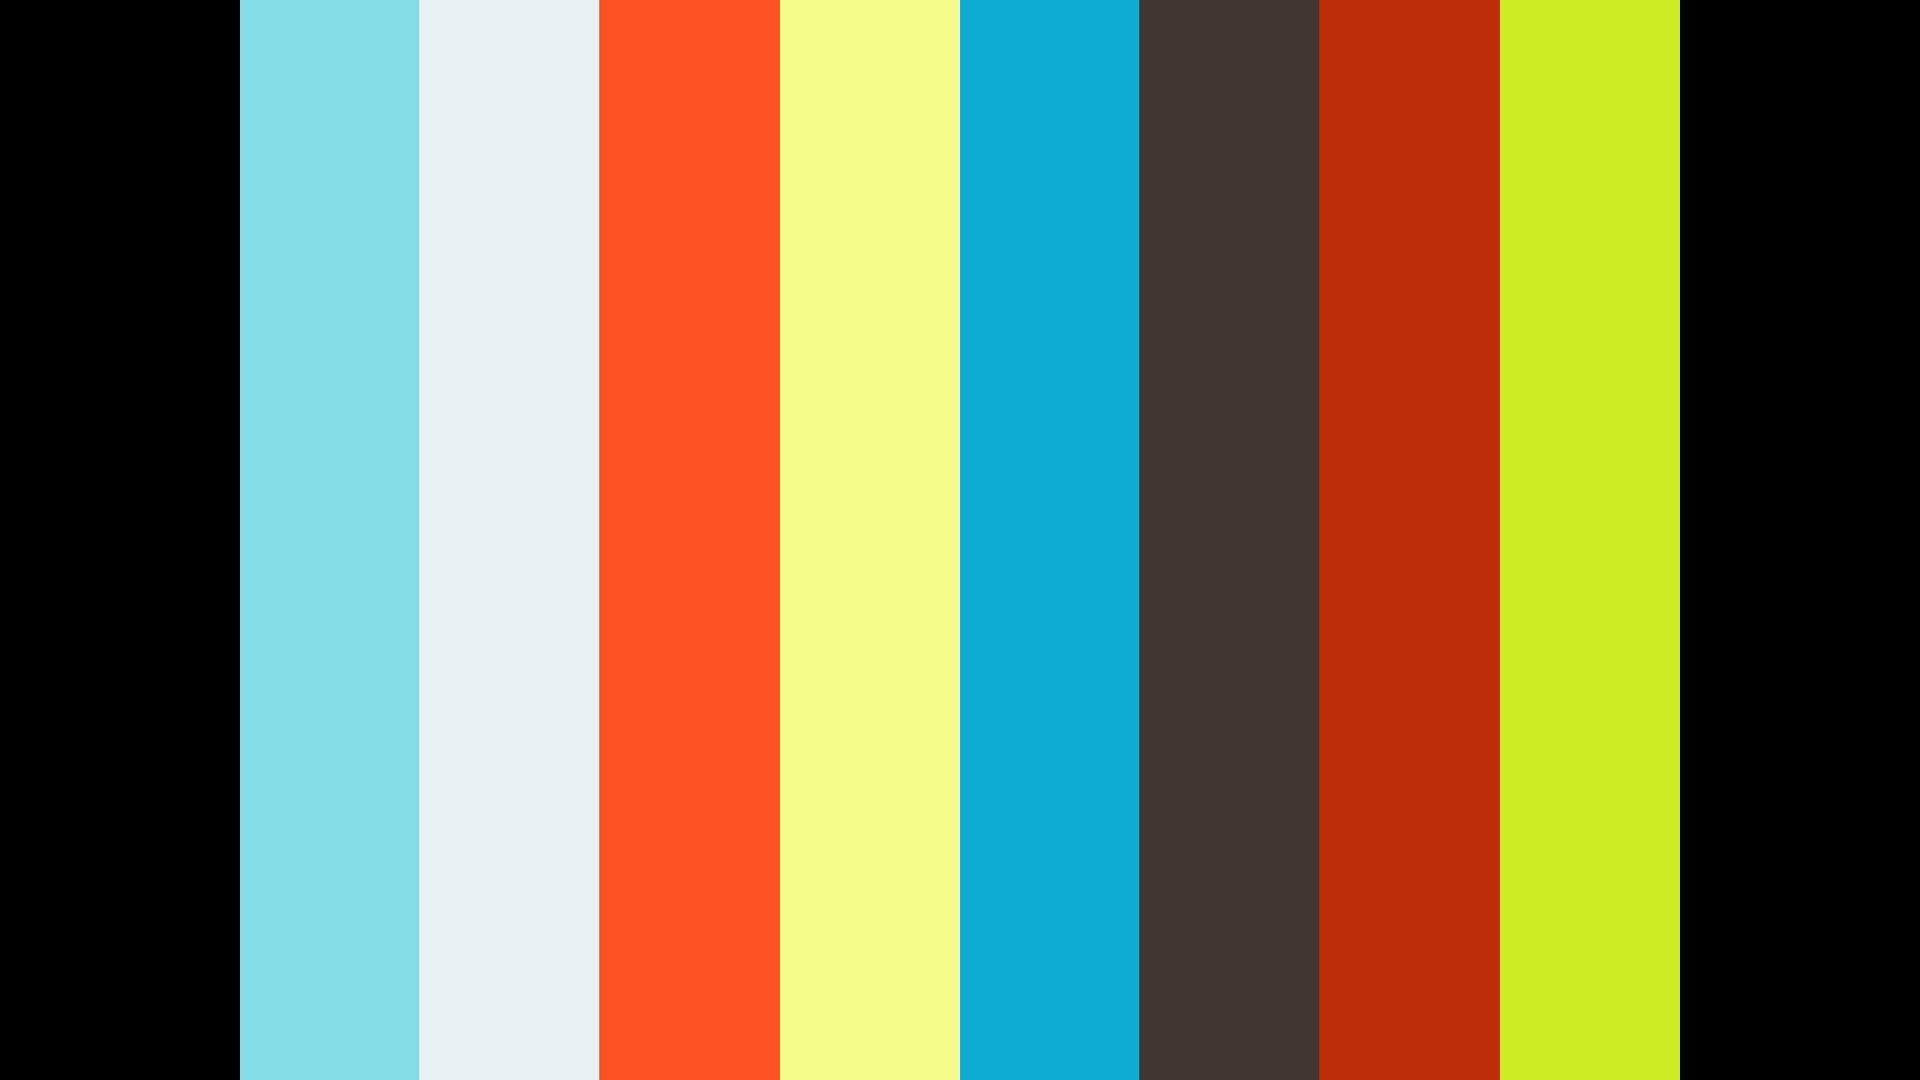 PalomArt L.A.B. - Mixing the media